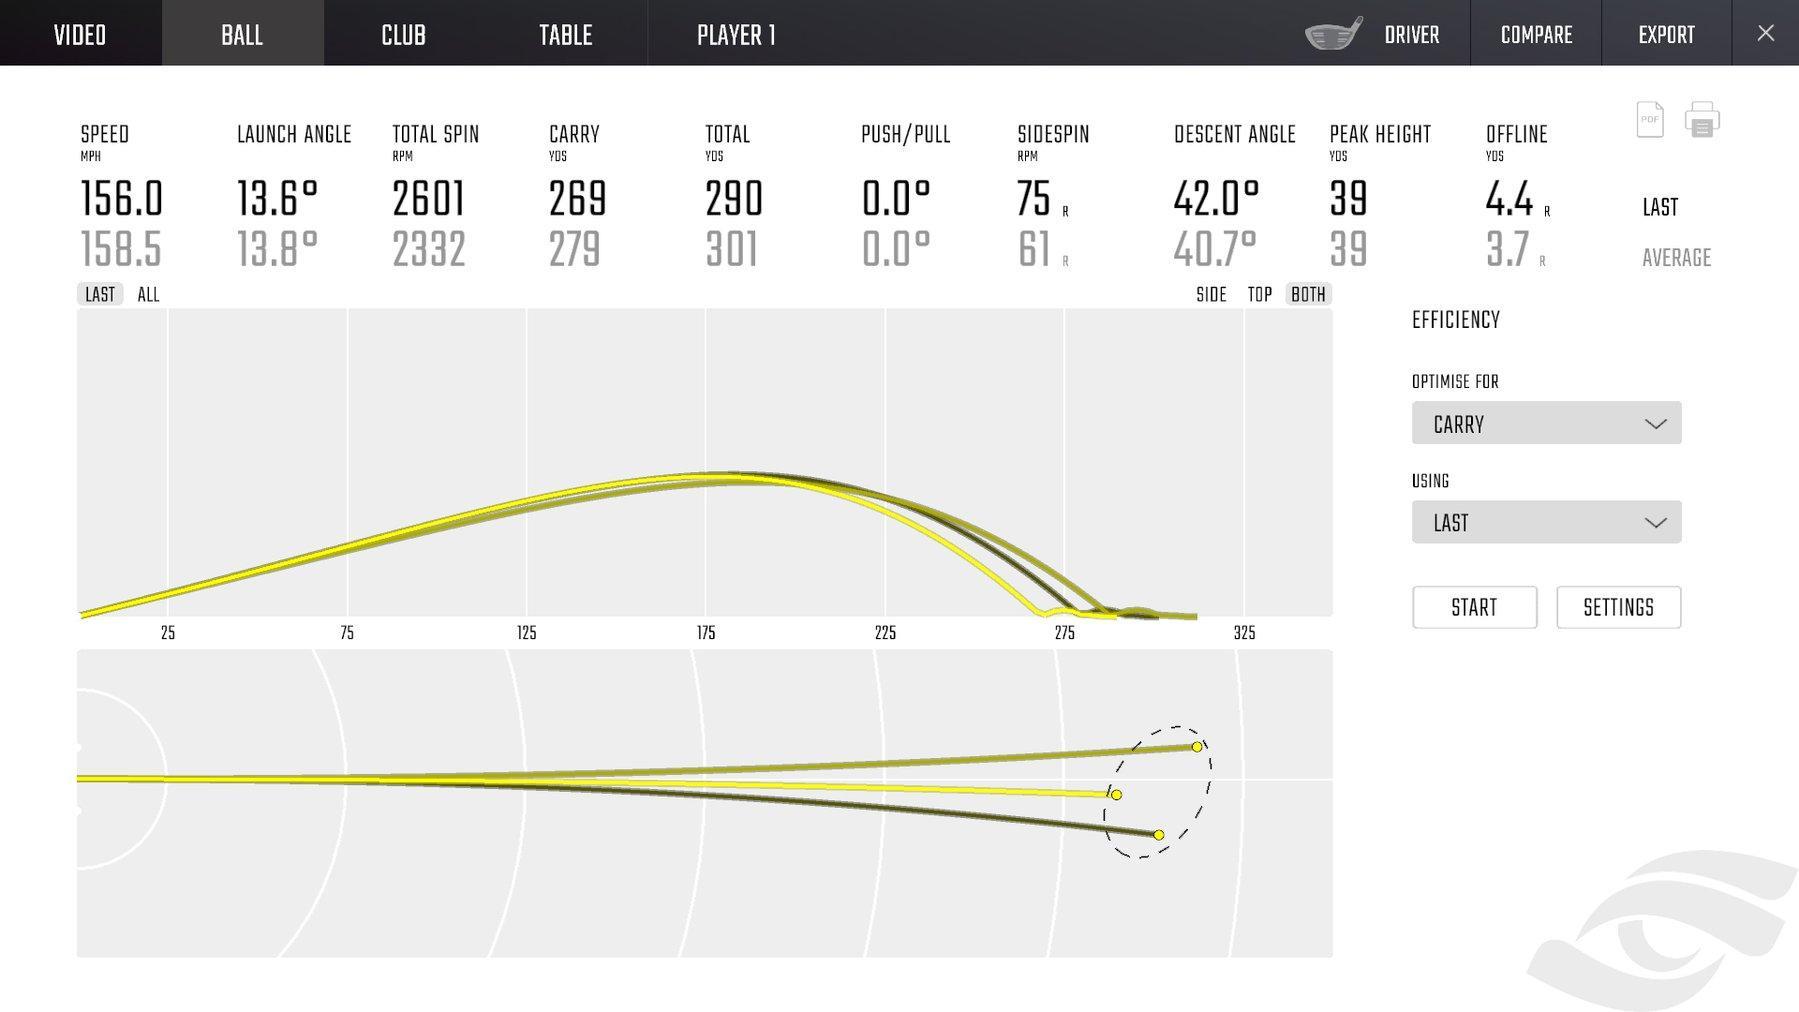 Golf Simulator Data